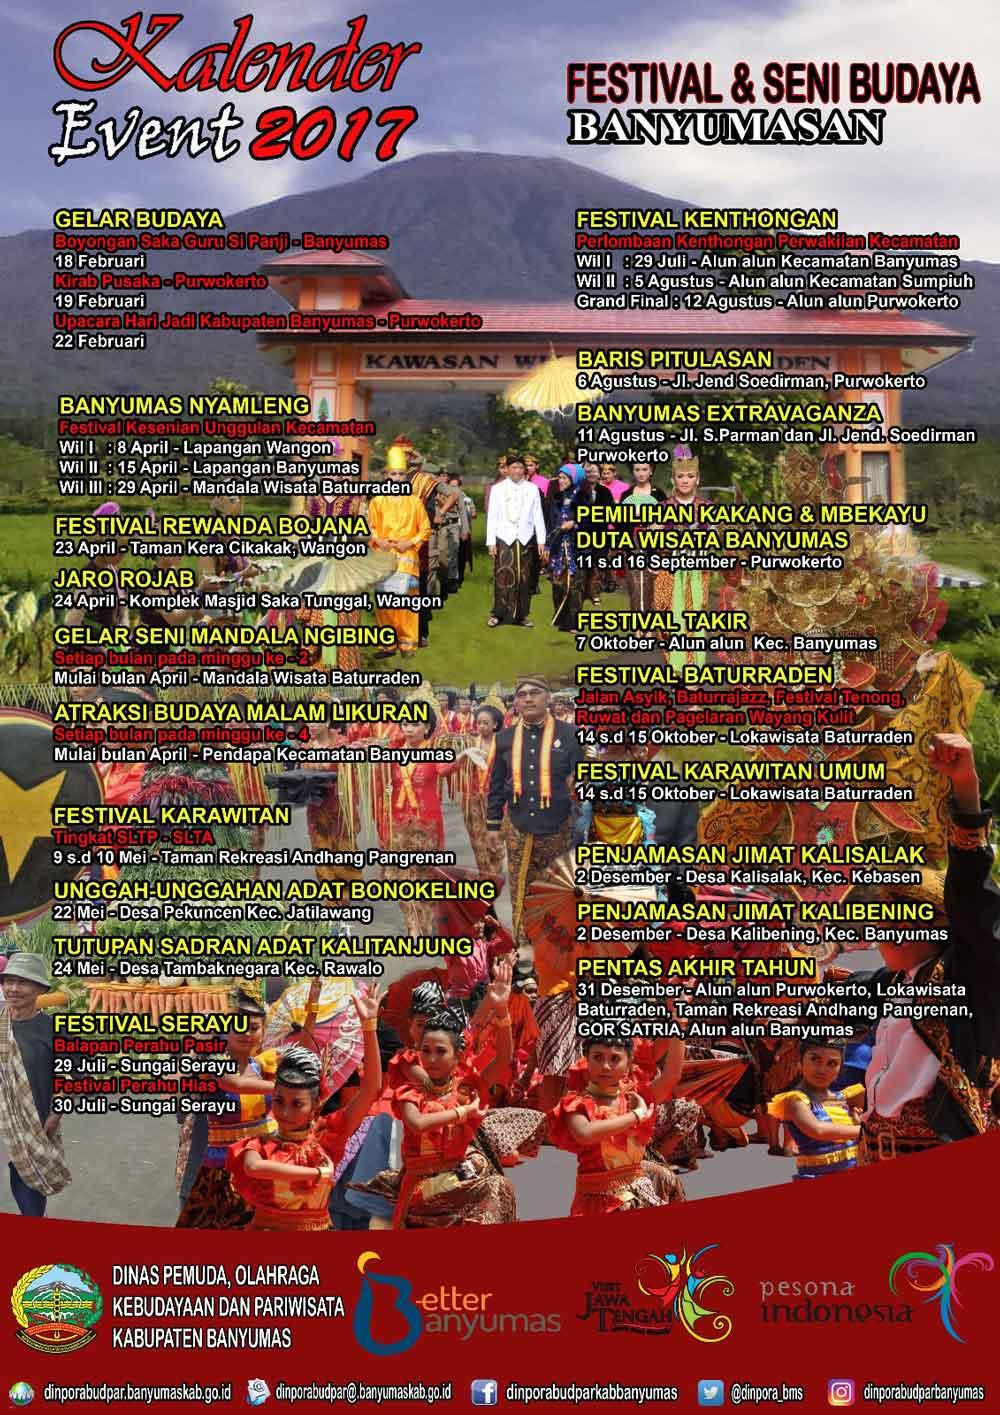 Kalender Event Banyumas 2017 Purwokerto Guidance Taman Satria Kab